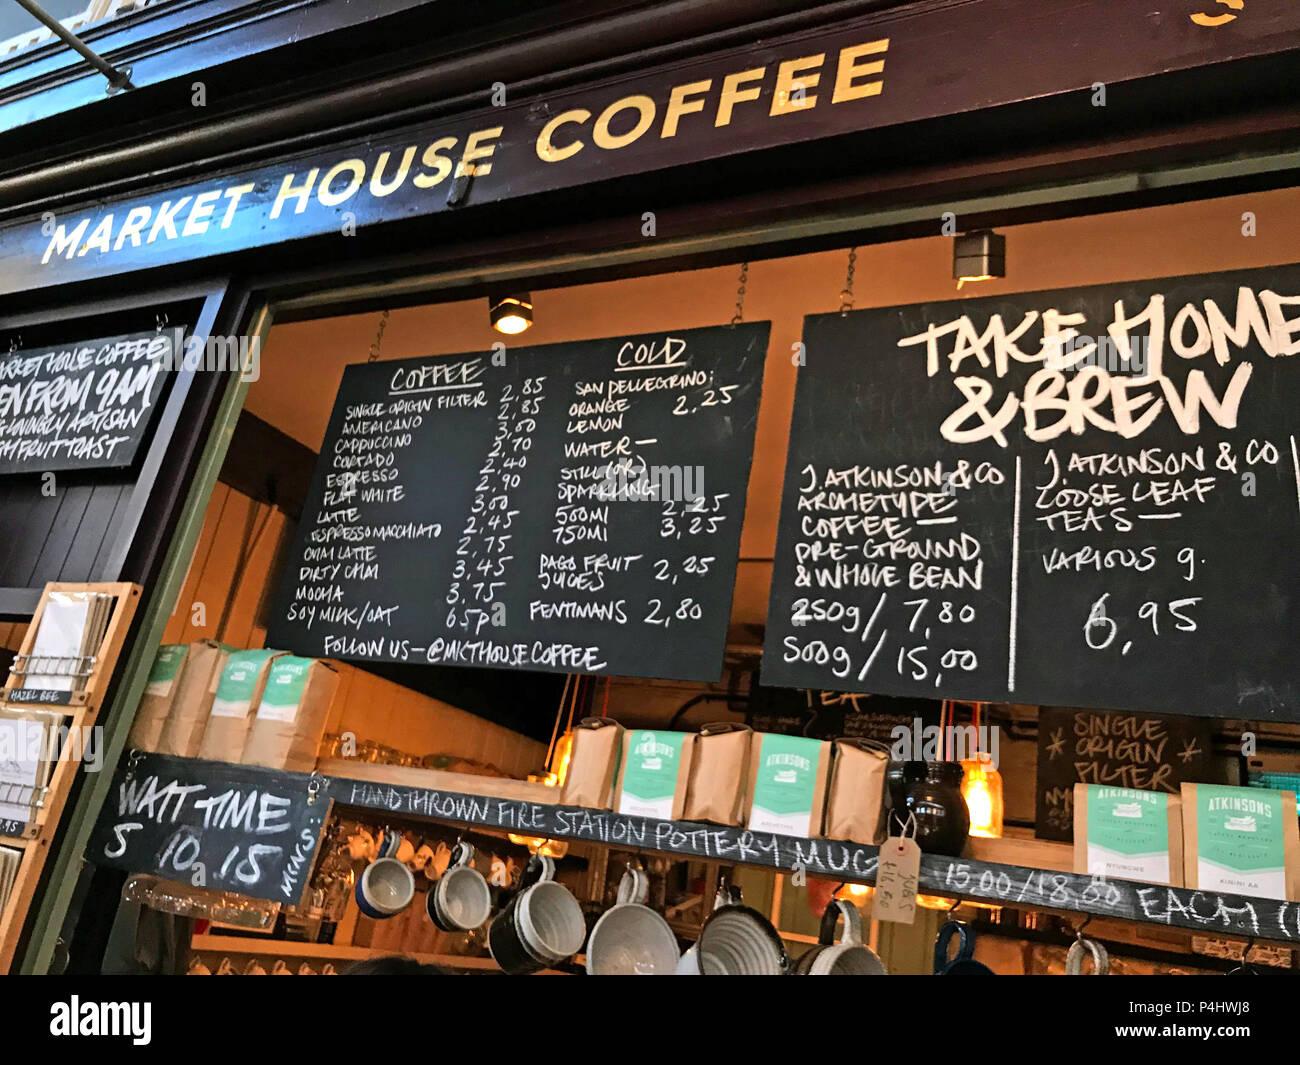 GoTonySmith,@HotpixUK,HotpixUK,shop,Altrincham Market,Hall,successful,high streets,stall,popup,stand,Take Home,brew,Take Home & Brew,Market House Coffee stall,Altrincham market,hall,Market Street,tea,tea stall